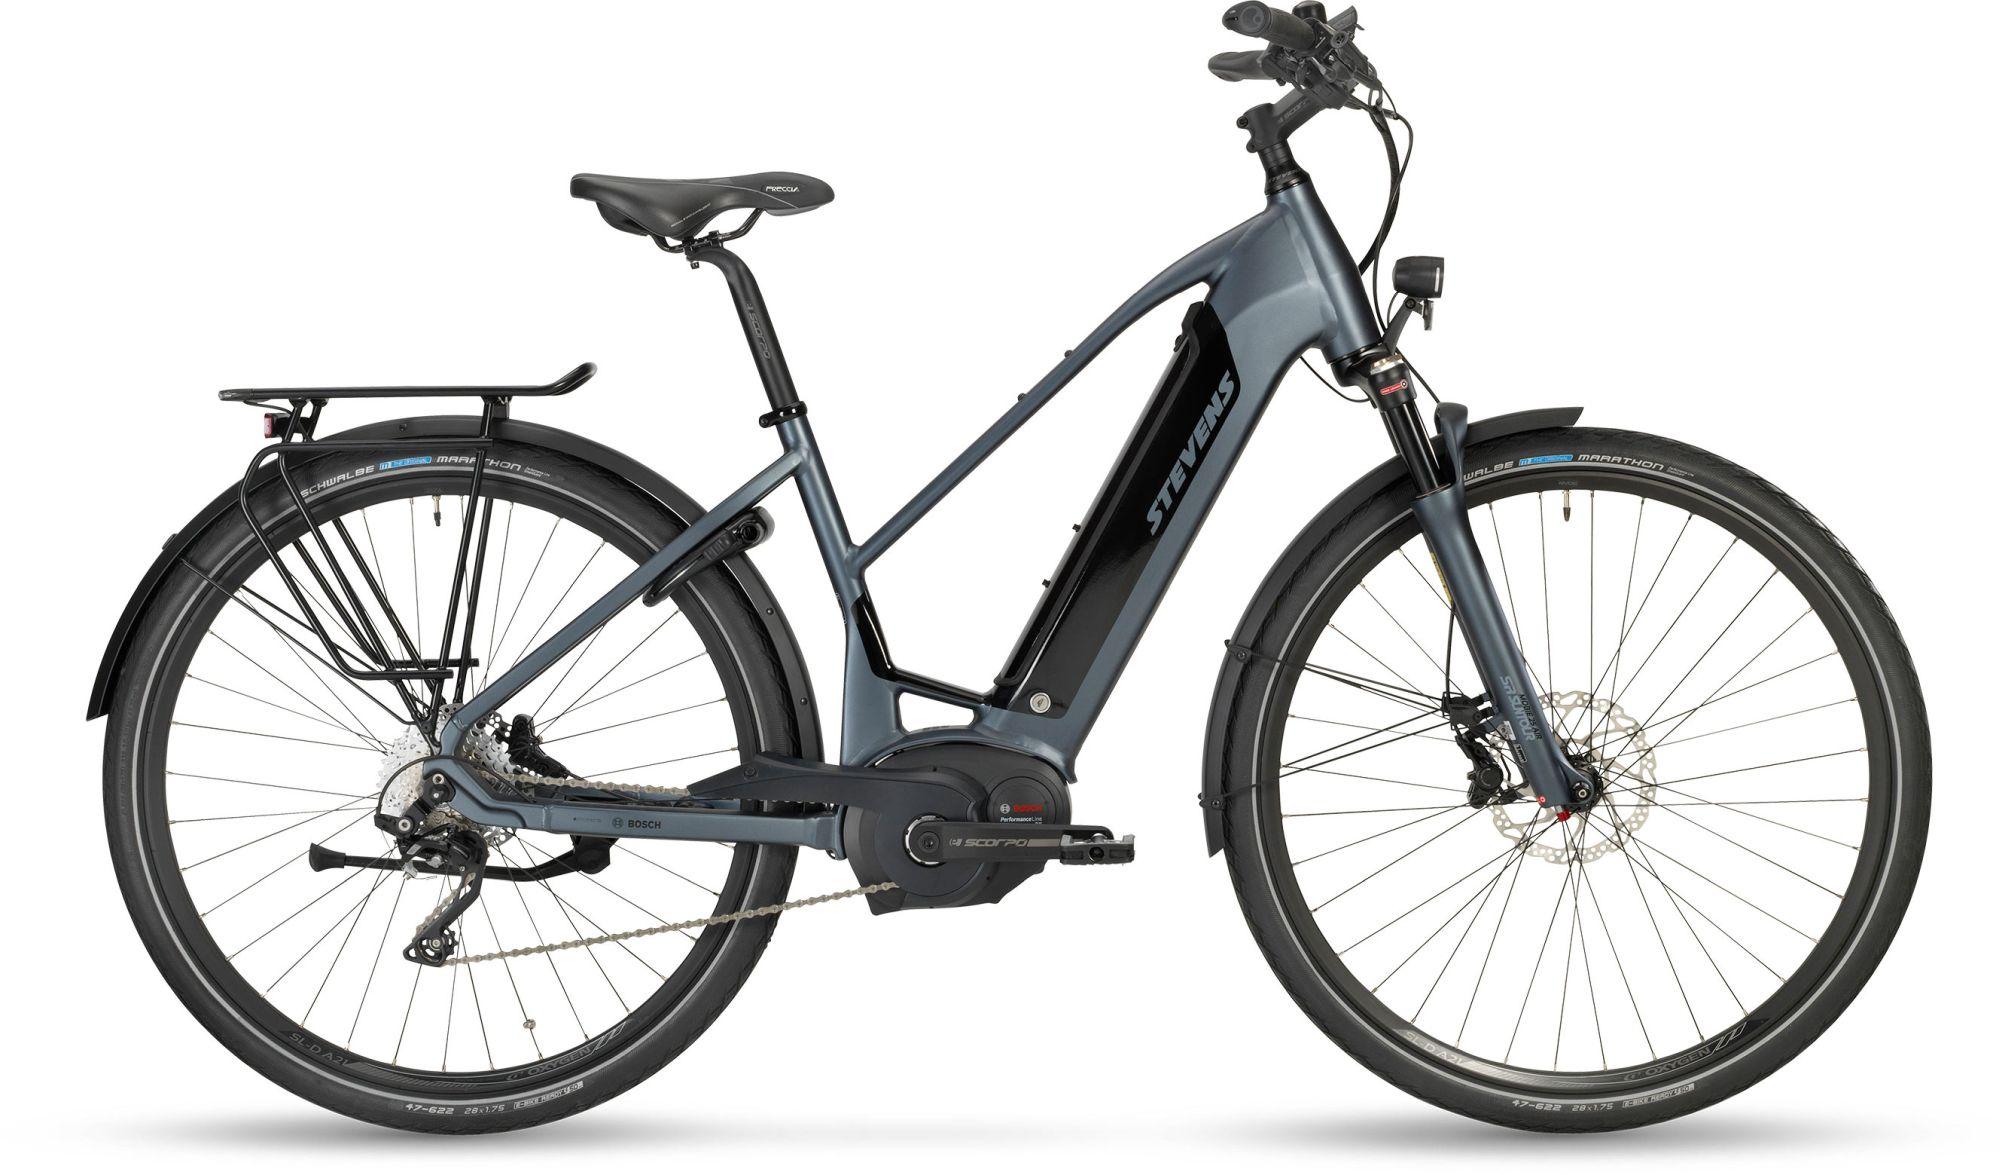 E-Bikes: STEVENS  E-TRITON PT5 Damenfahrrad Trapez Modell 2019 28 Zoll 50 cm